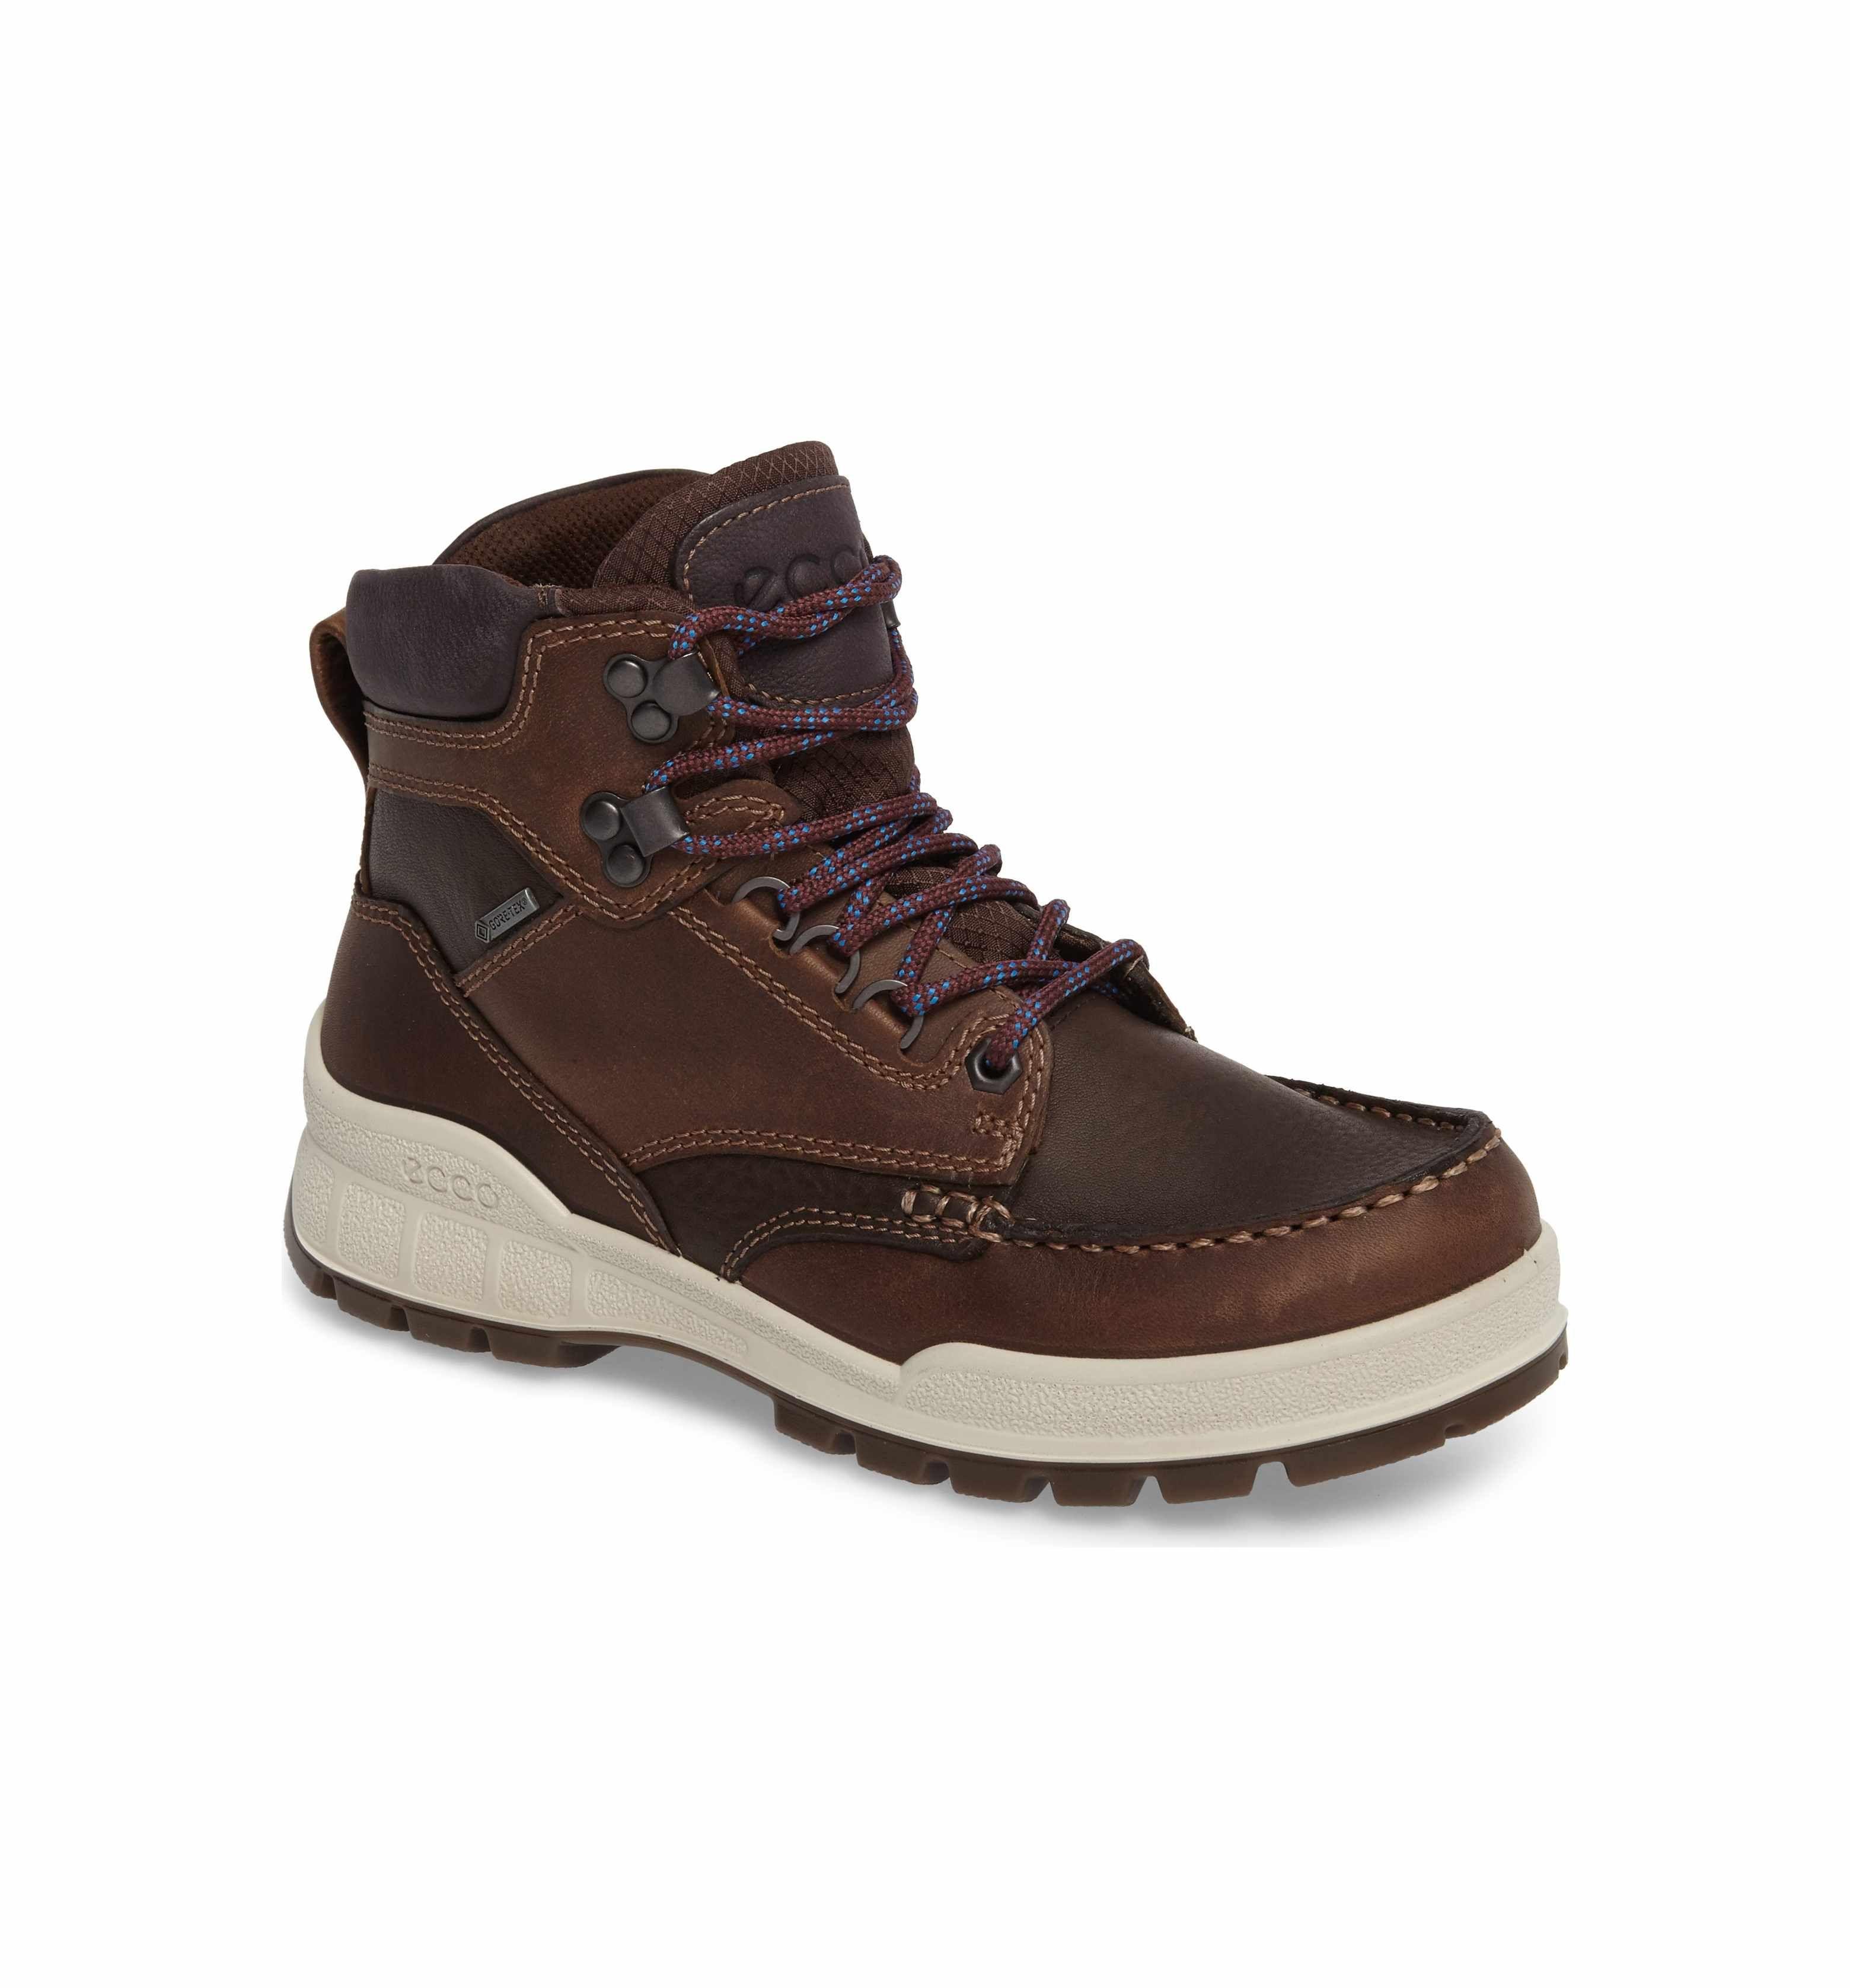 Main Image - ECCO Track 25 Gore-Tex® Waterproof Hiking Boot (Women)